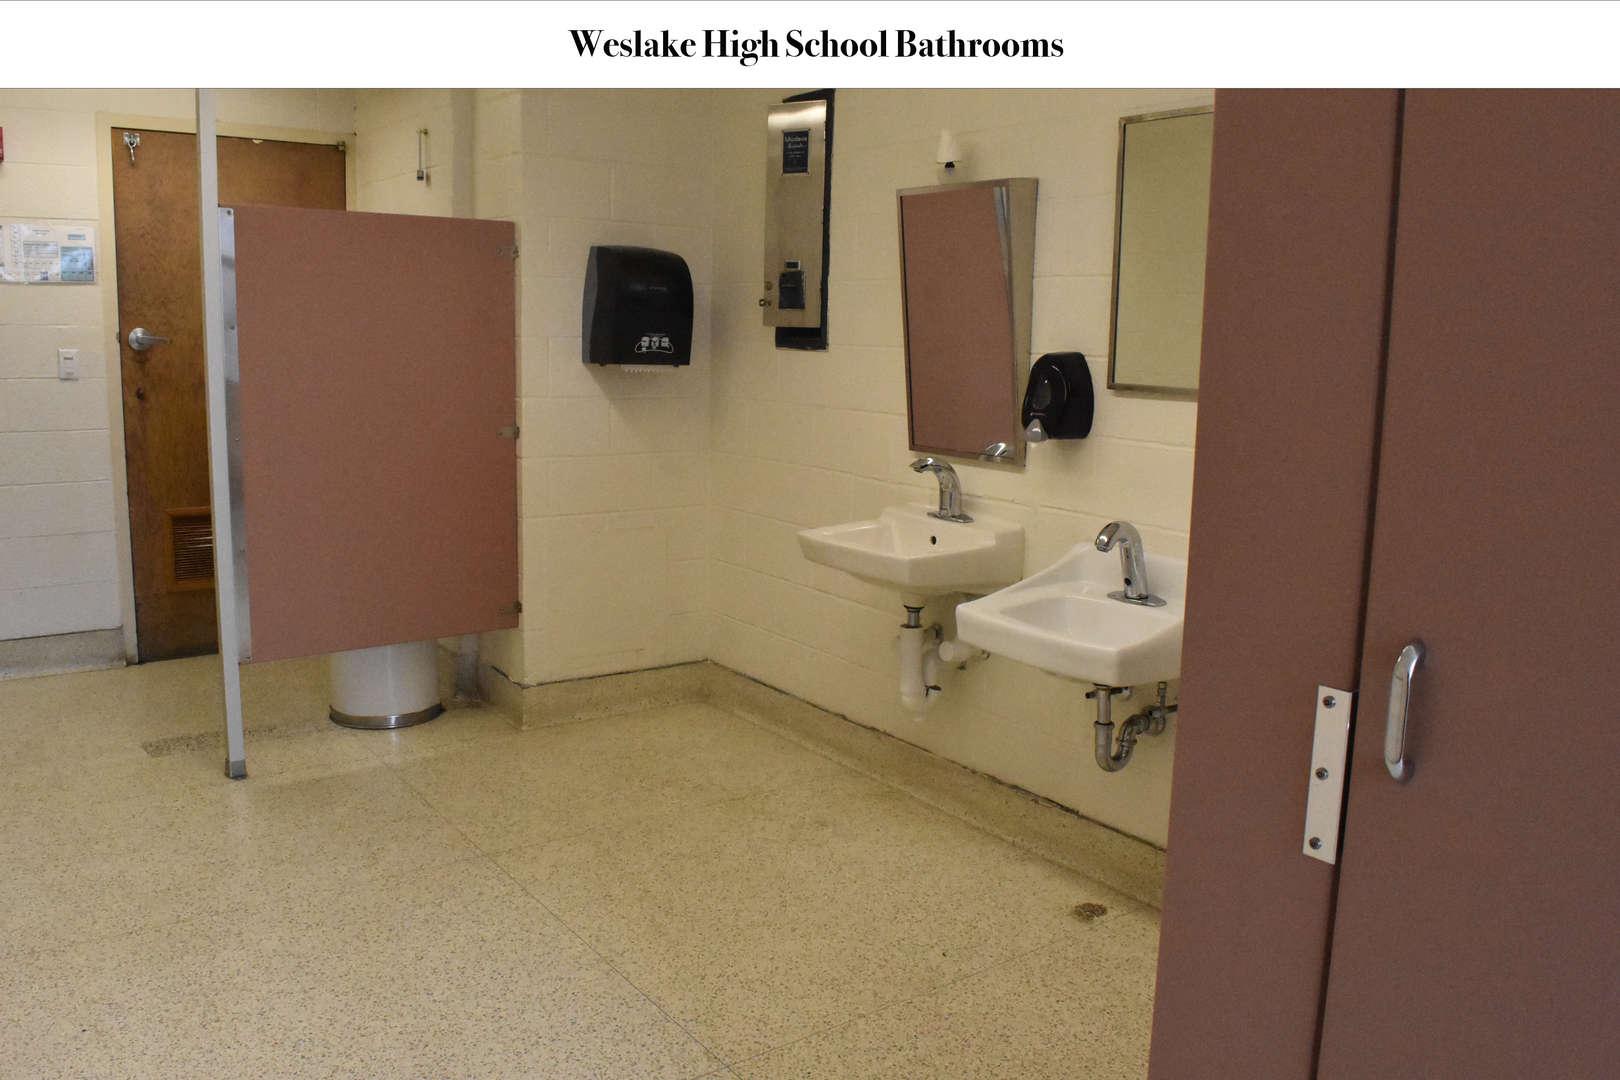 WHS bathroom sinks before renovation